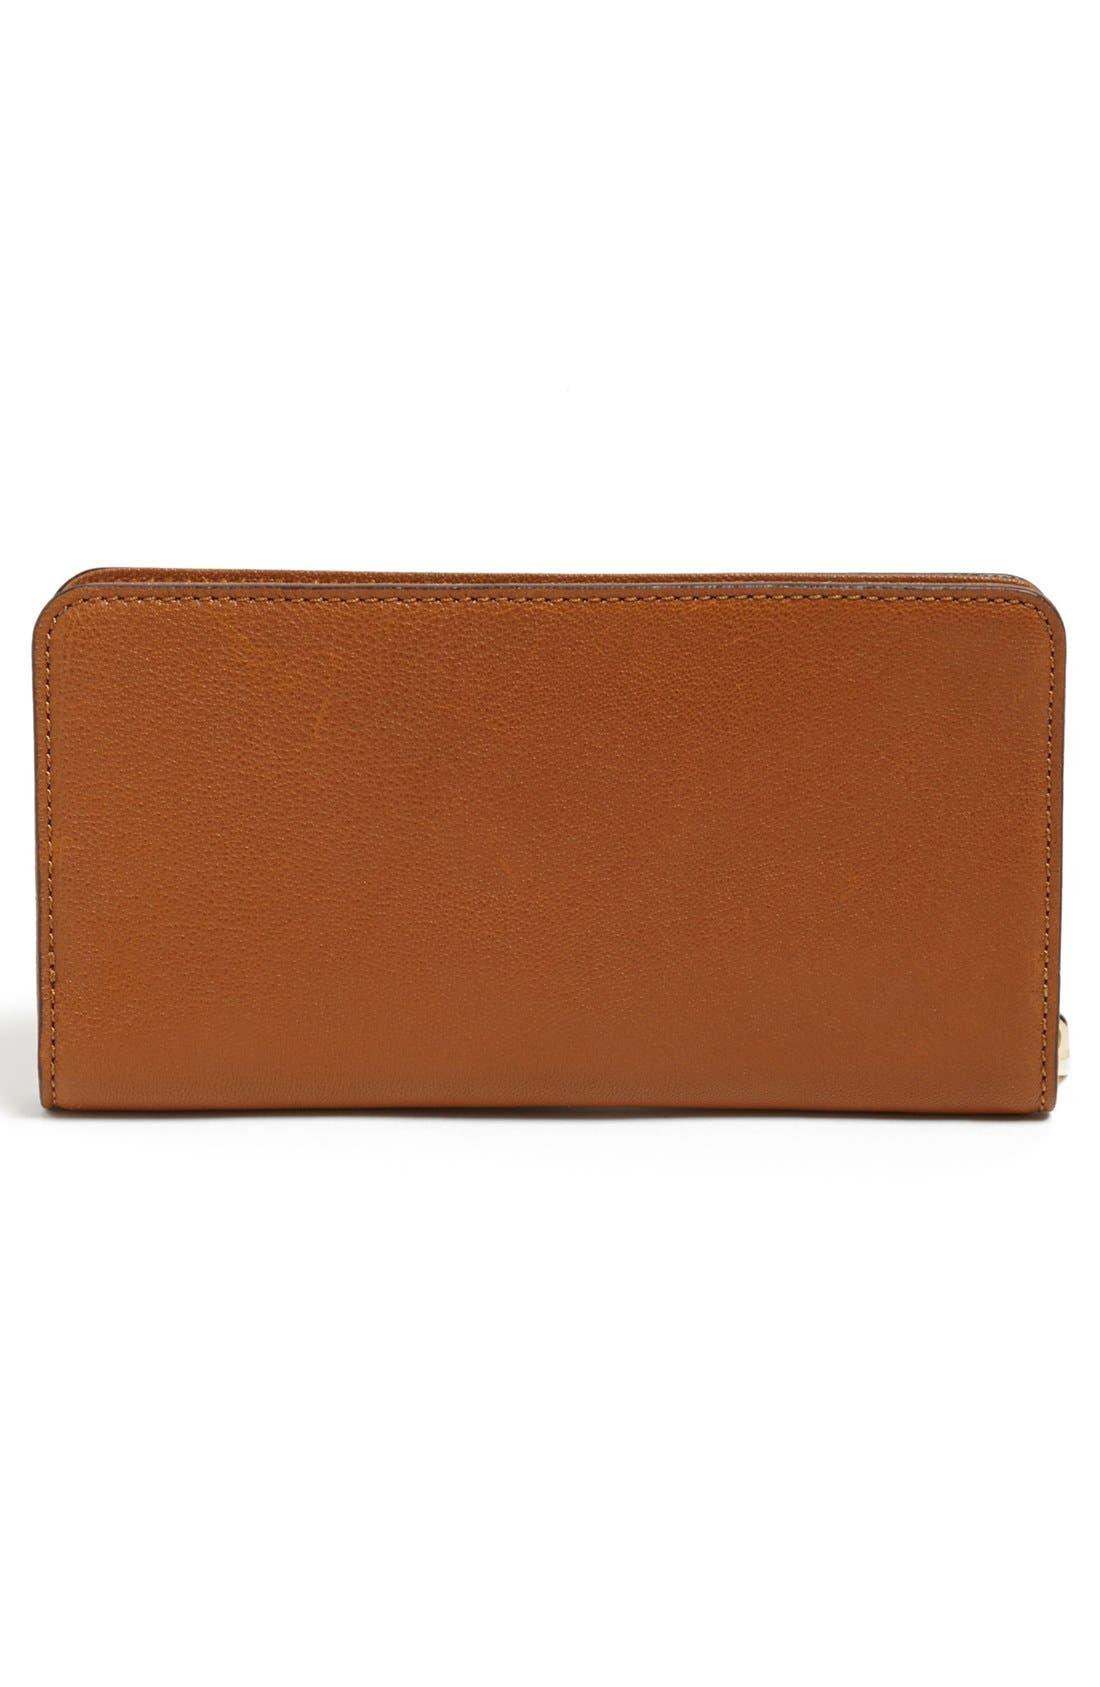 Alternate Image 3  - MICHAEL Michael Kors 'Hamilton - Large' Wallet